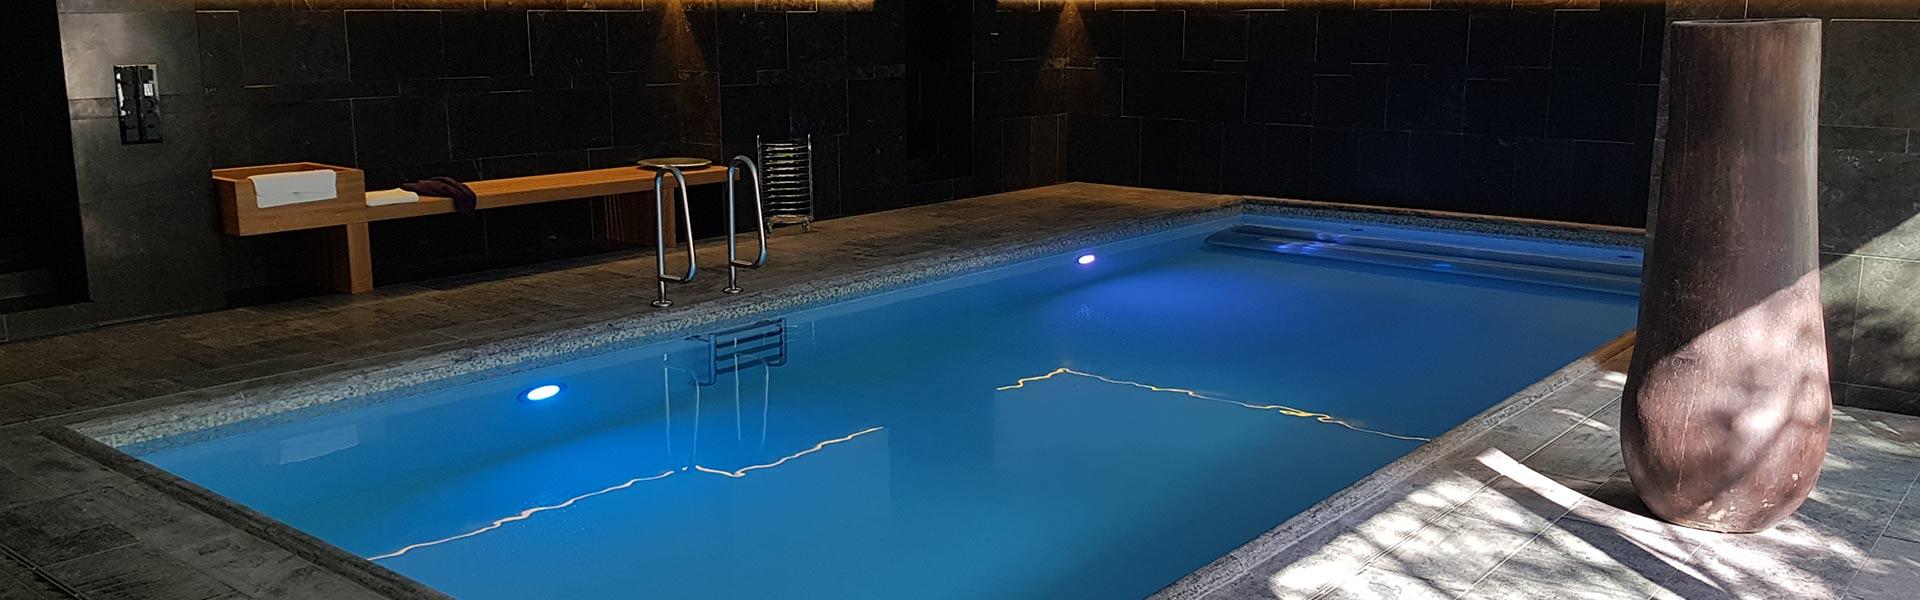 Wellness Pool im Dunkeln